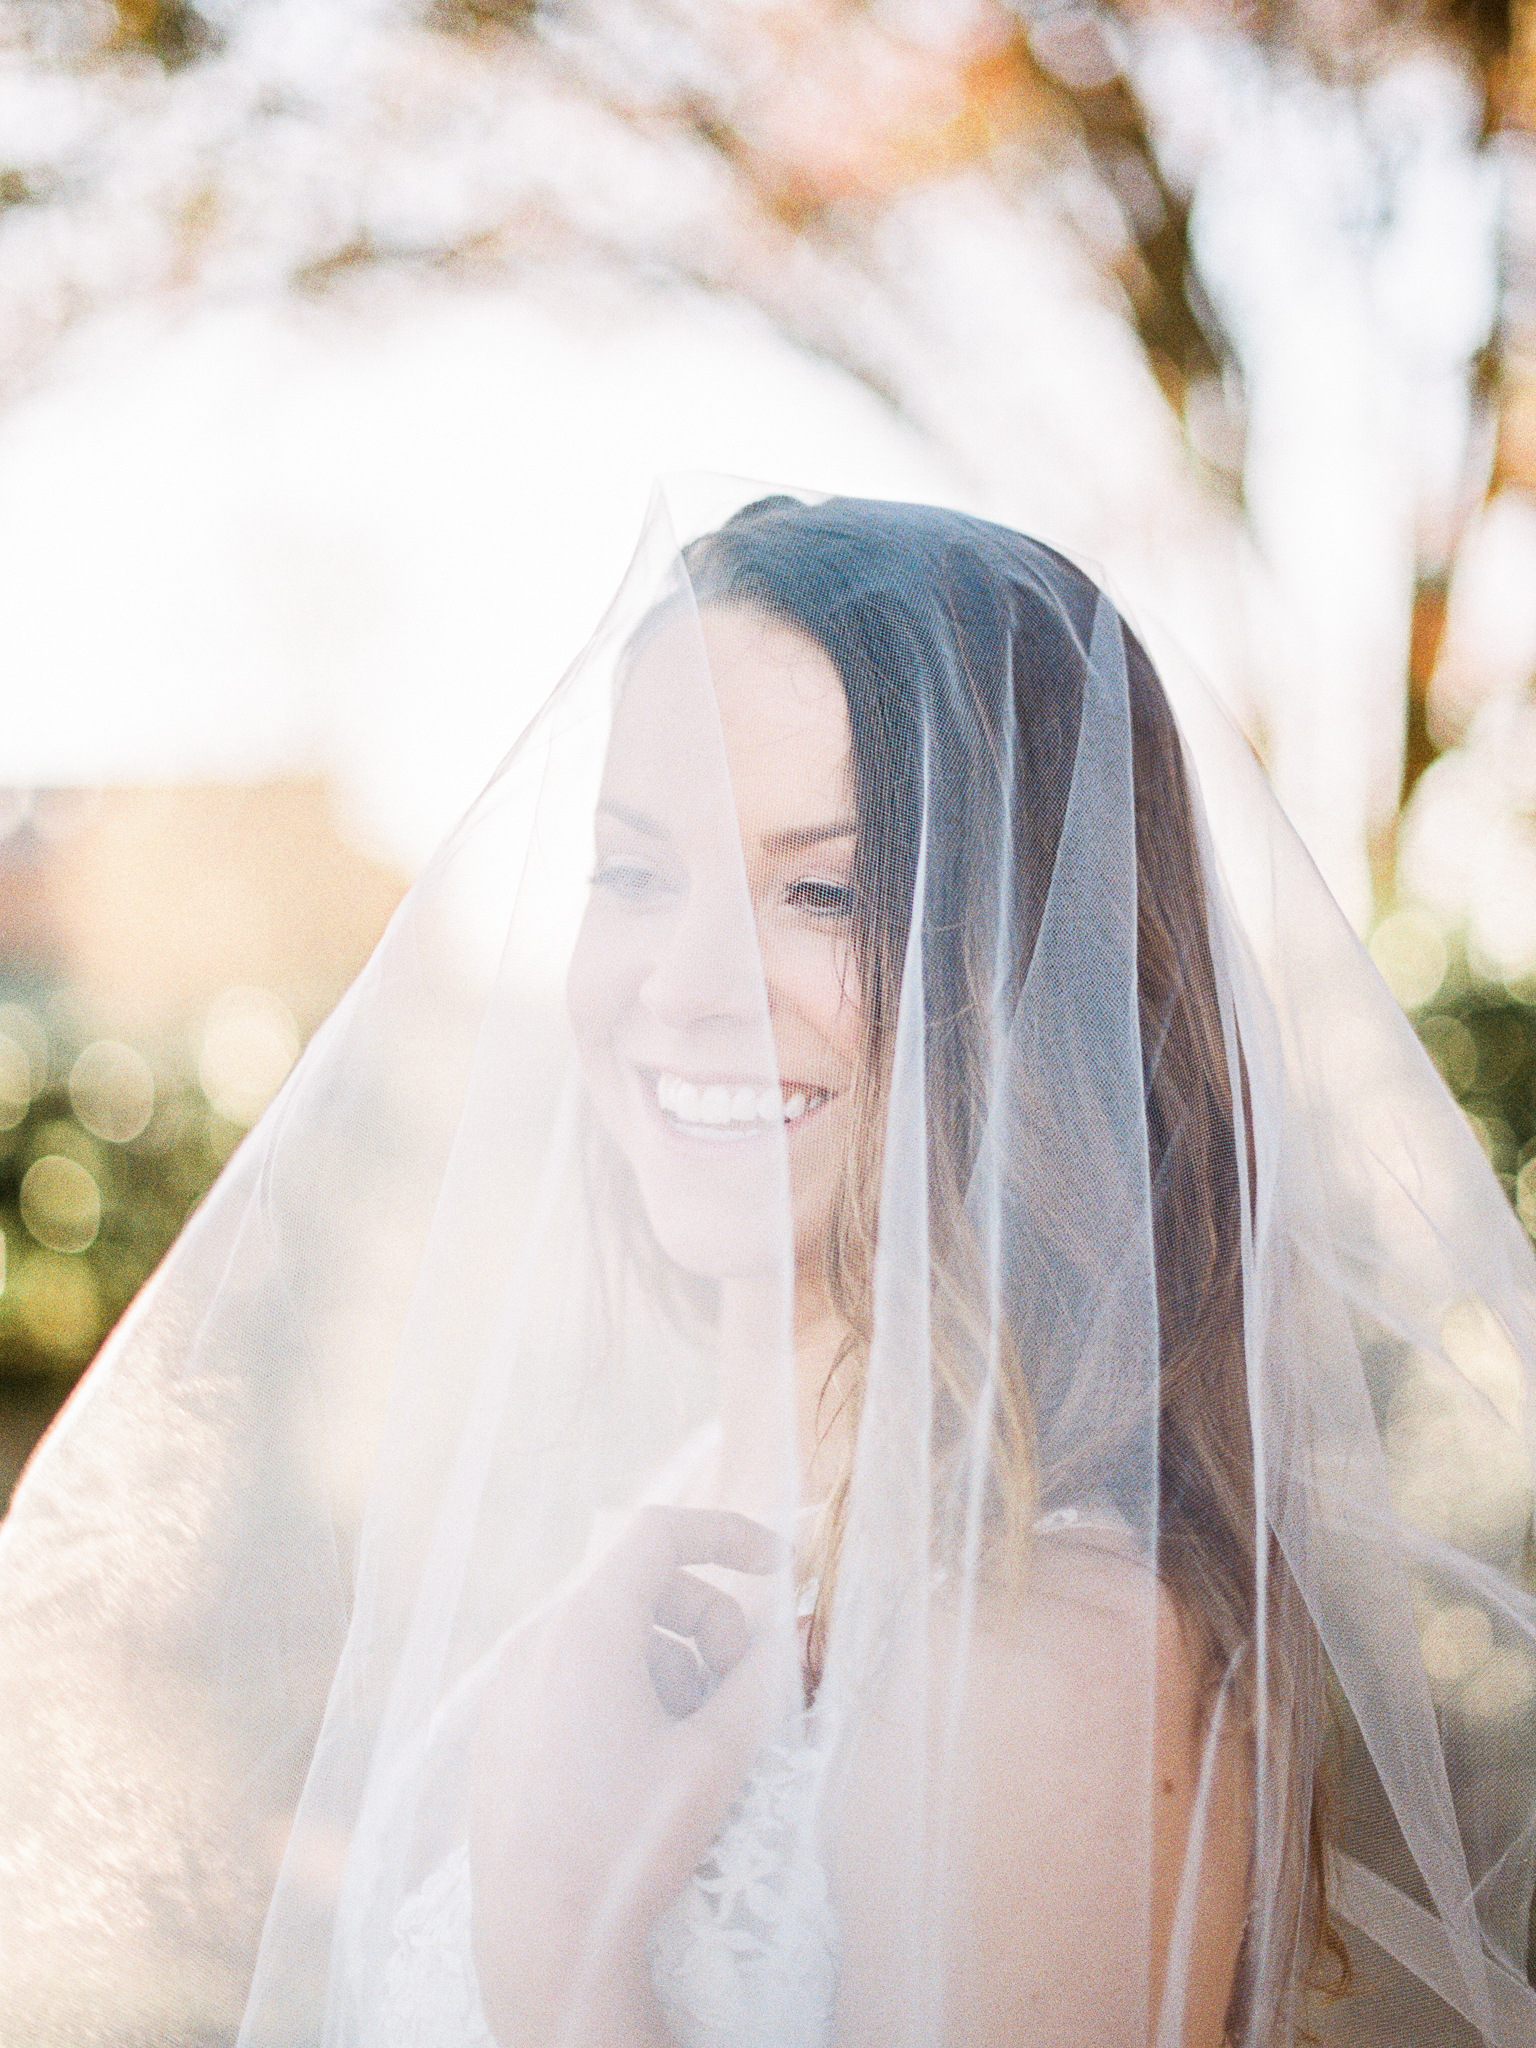 christinadavis+weddinginspiration32.jpg